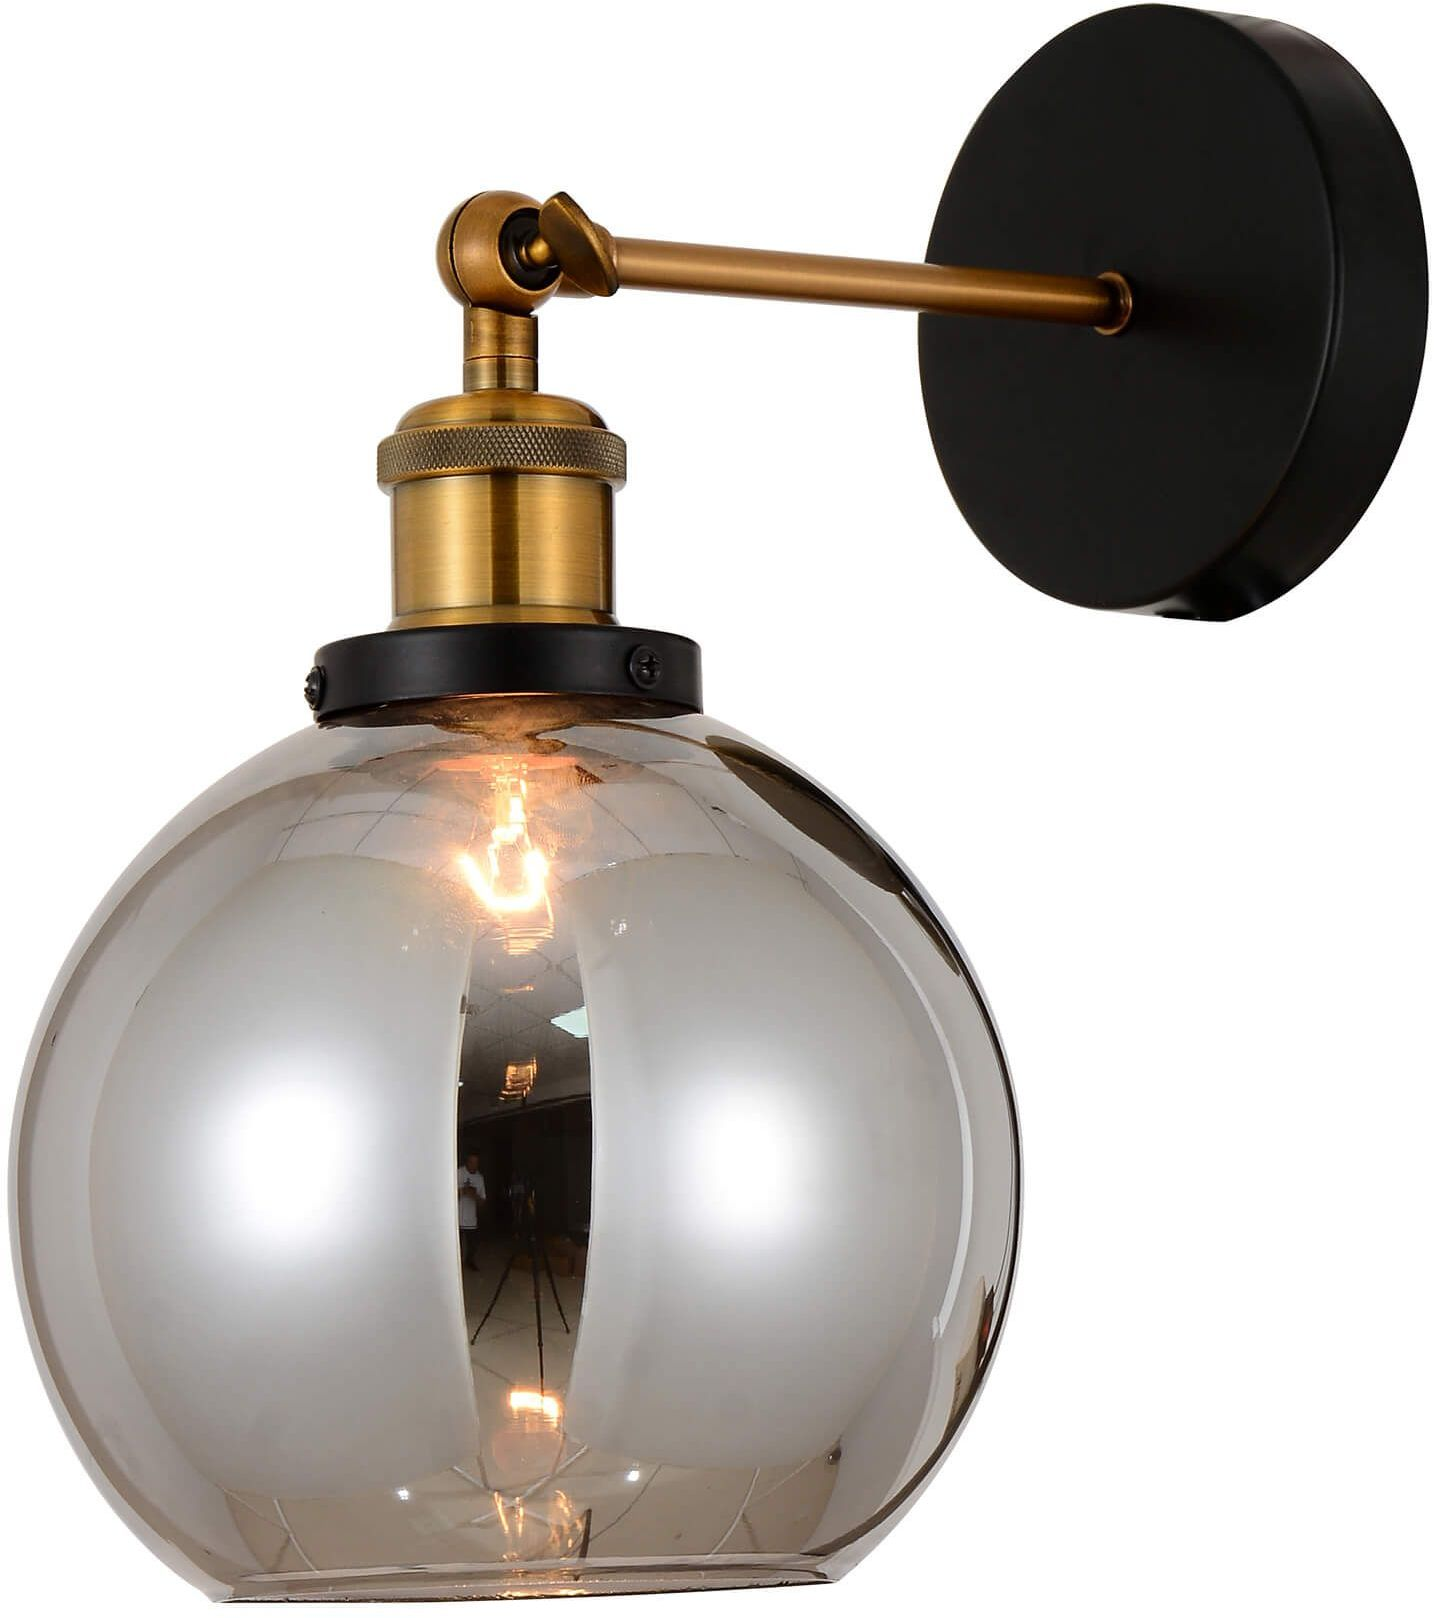 LAMPA ŚCIENNA KINKIET LOFT ZAGALLO